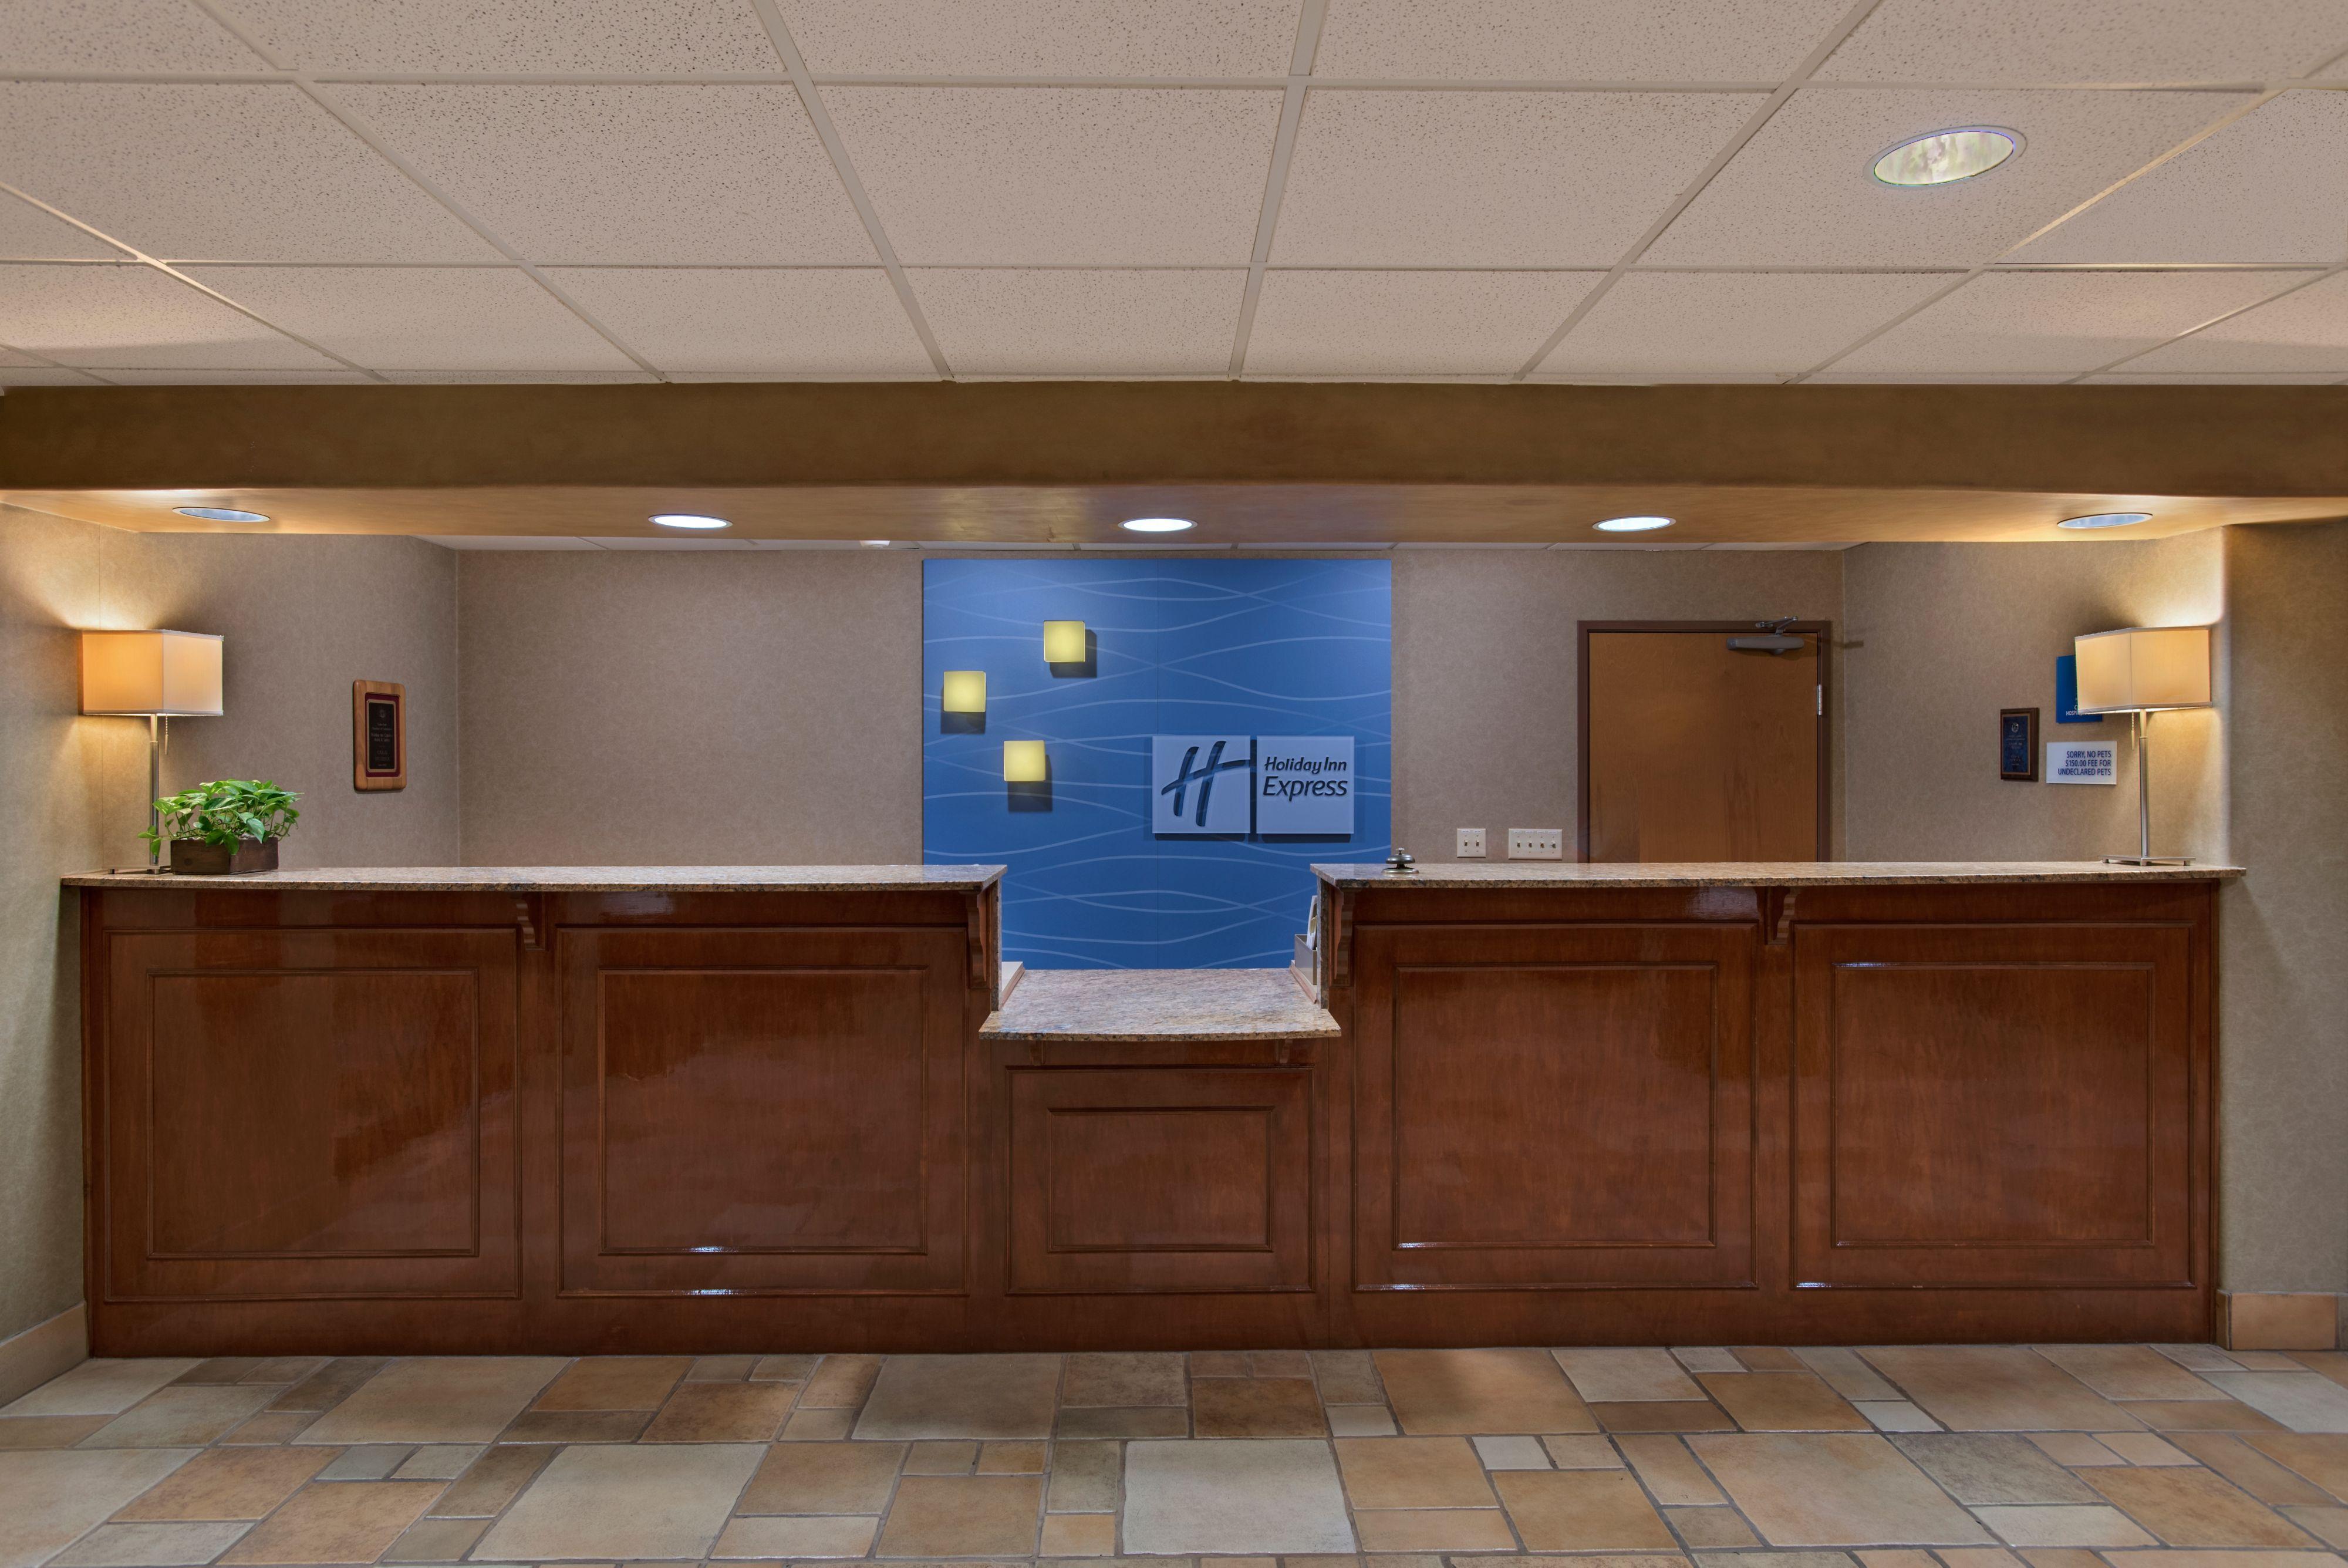 Holiday Inn Express & Suites Cedar Park (Nw Austin) image 5